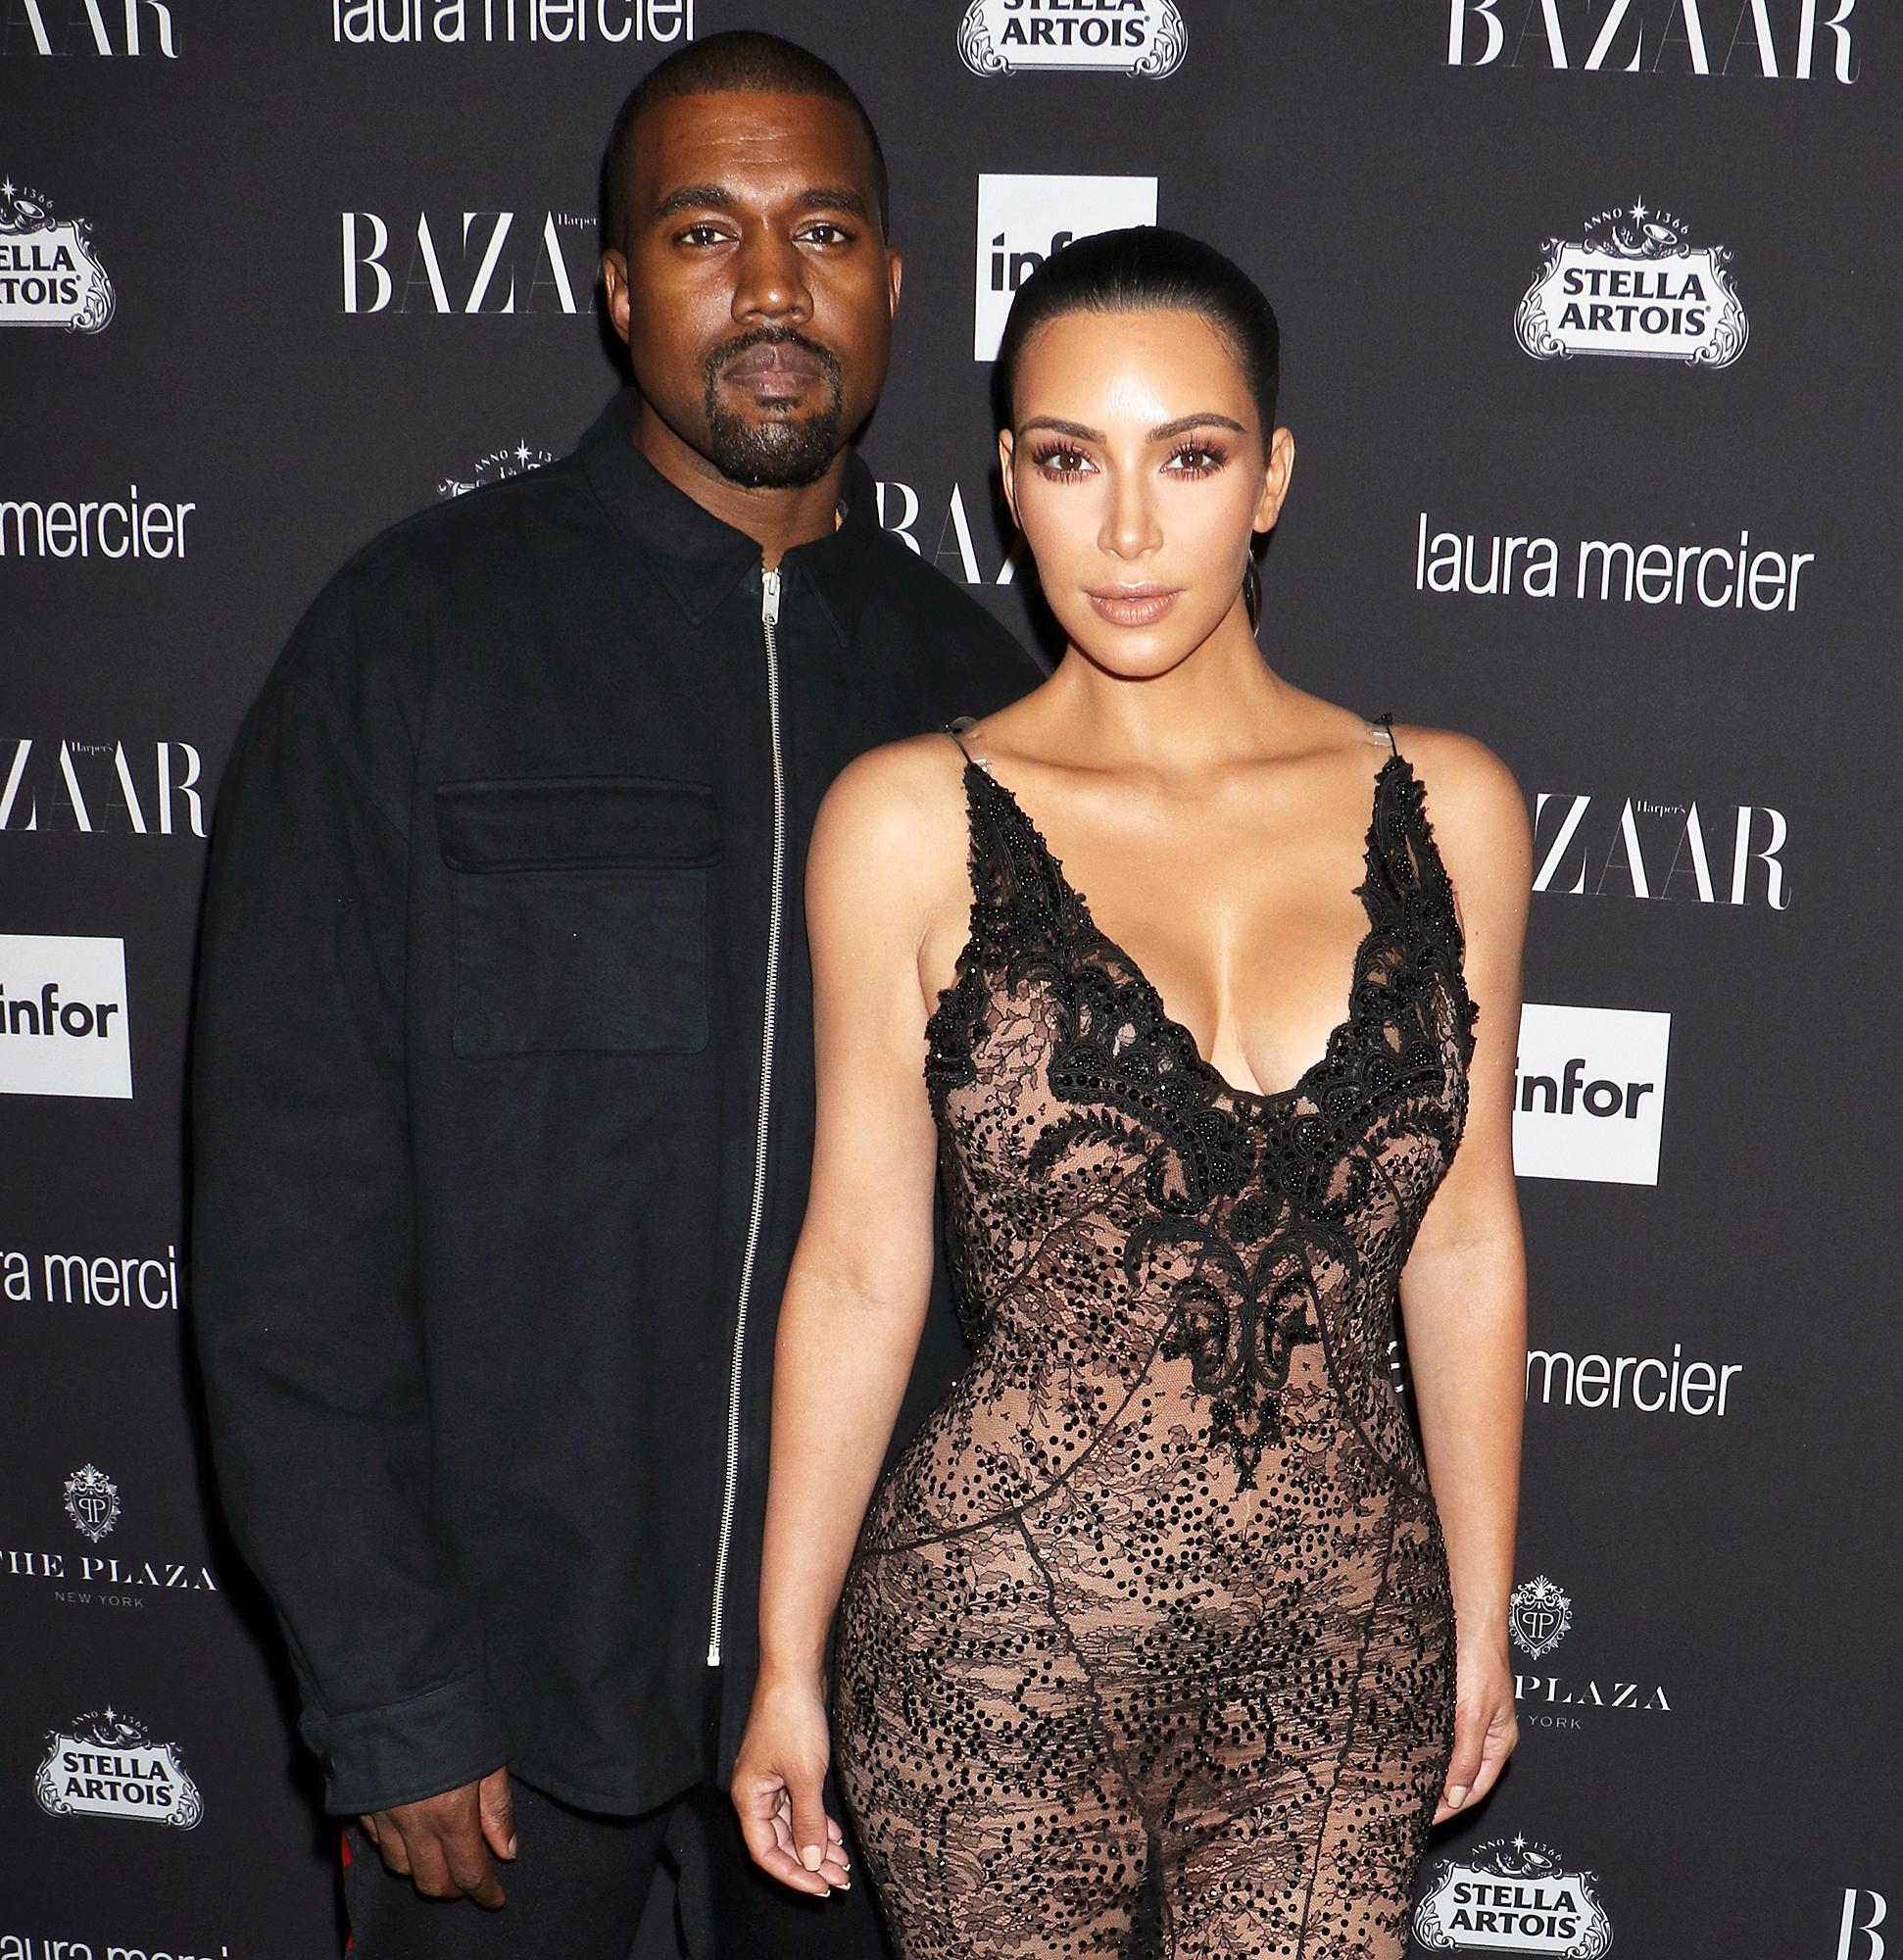 Kim Kardashian Breaks Silence on Kanye West Bi-Polar Disorder